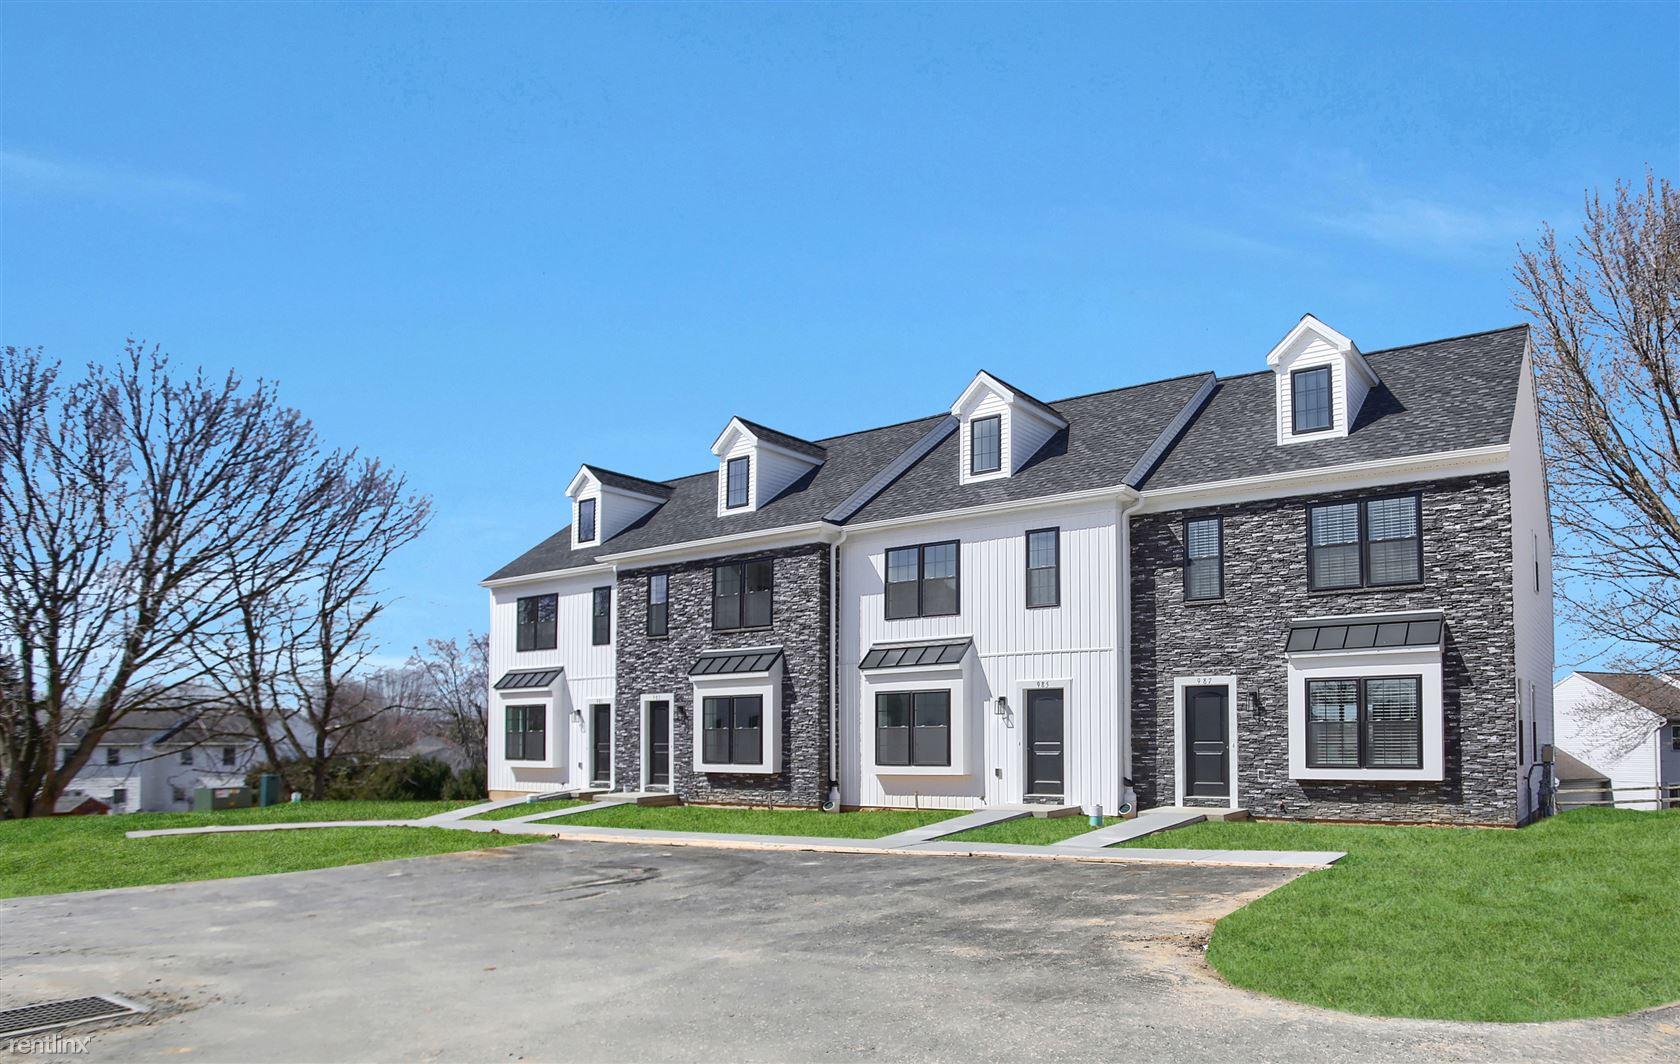 987 Old Elizabethtown Rd, Elizabethtown, PA - $1,695 USD/ month